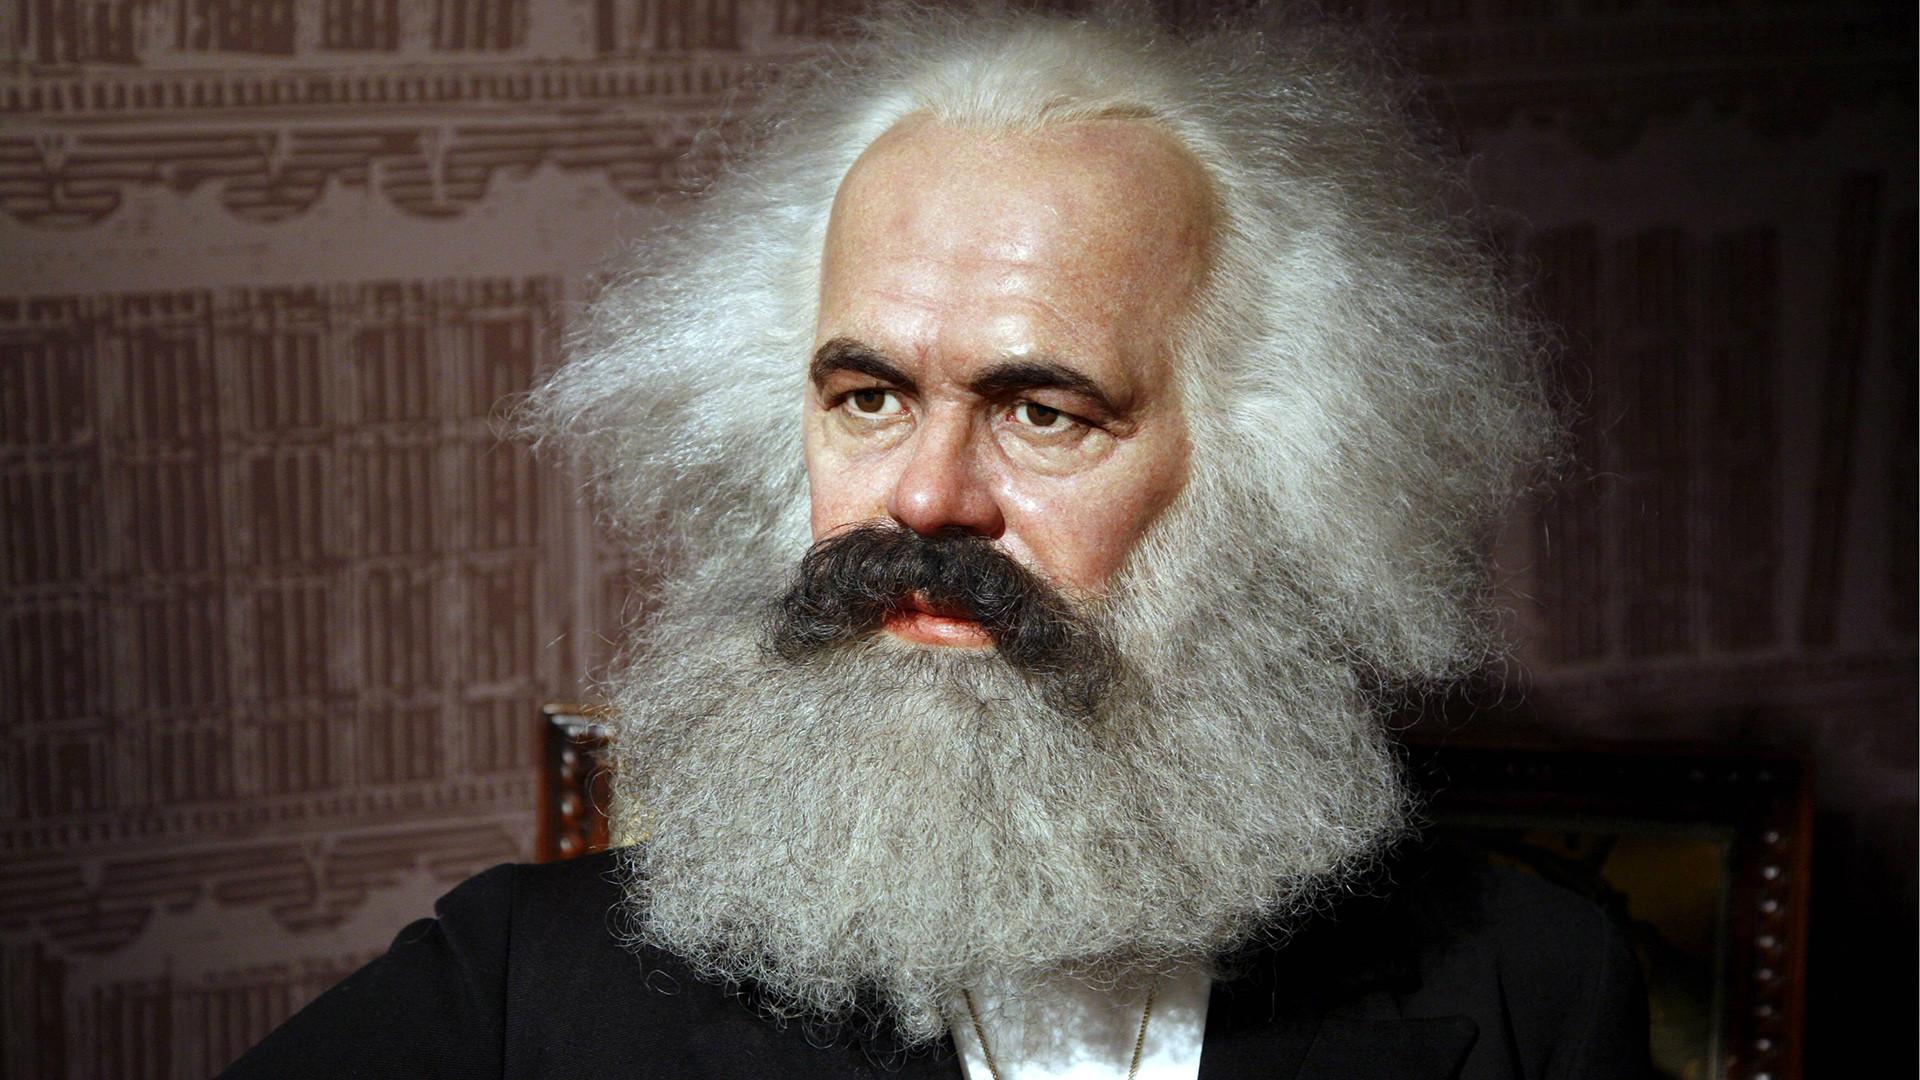 Karl Marx in Madame Tussauds museum, Berlin